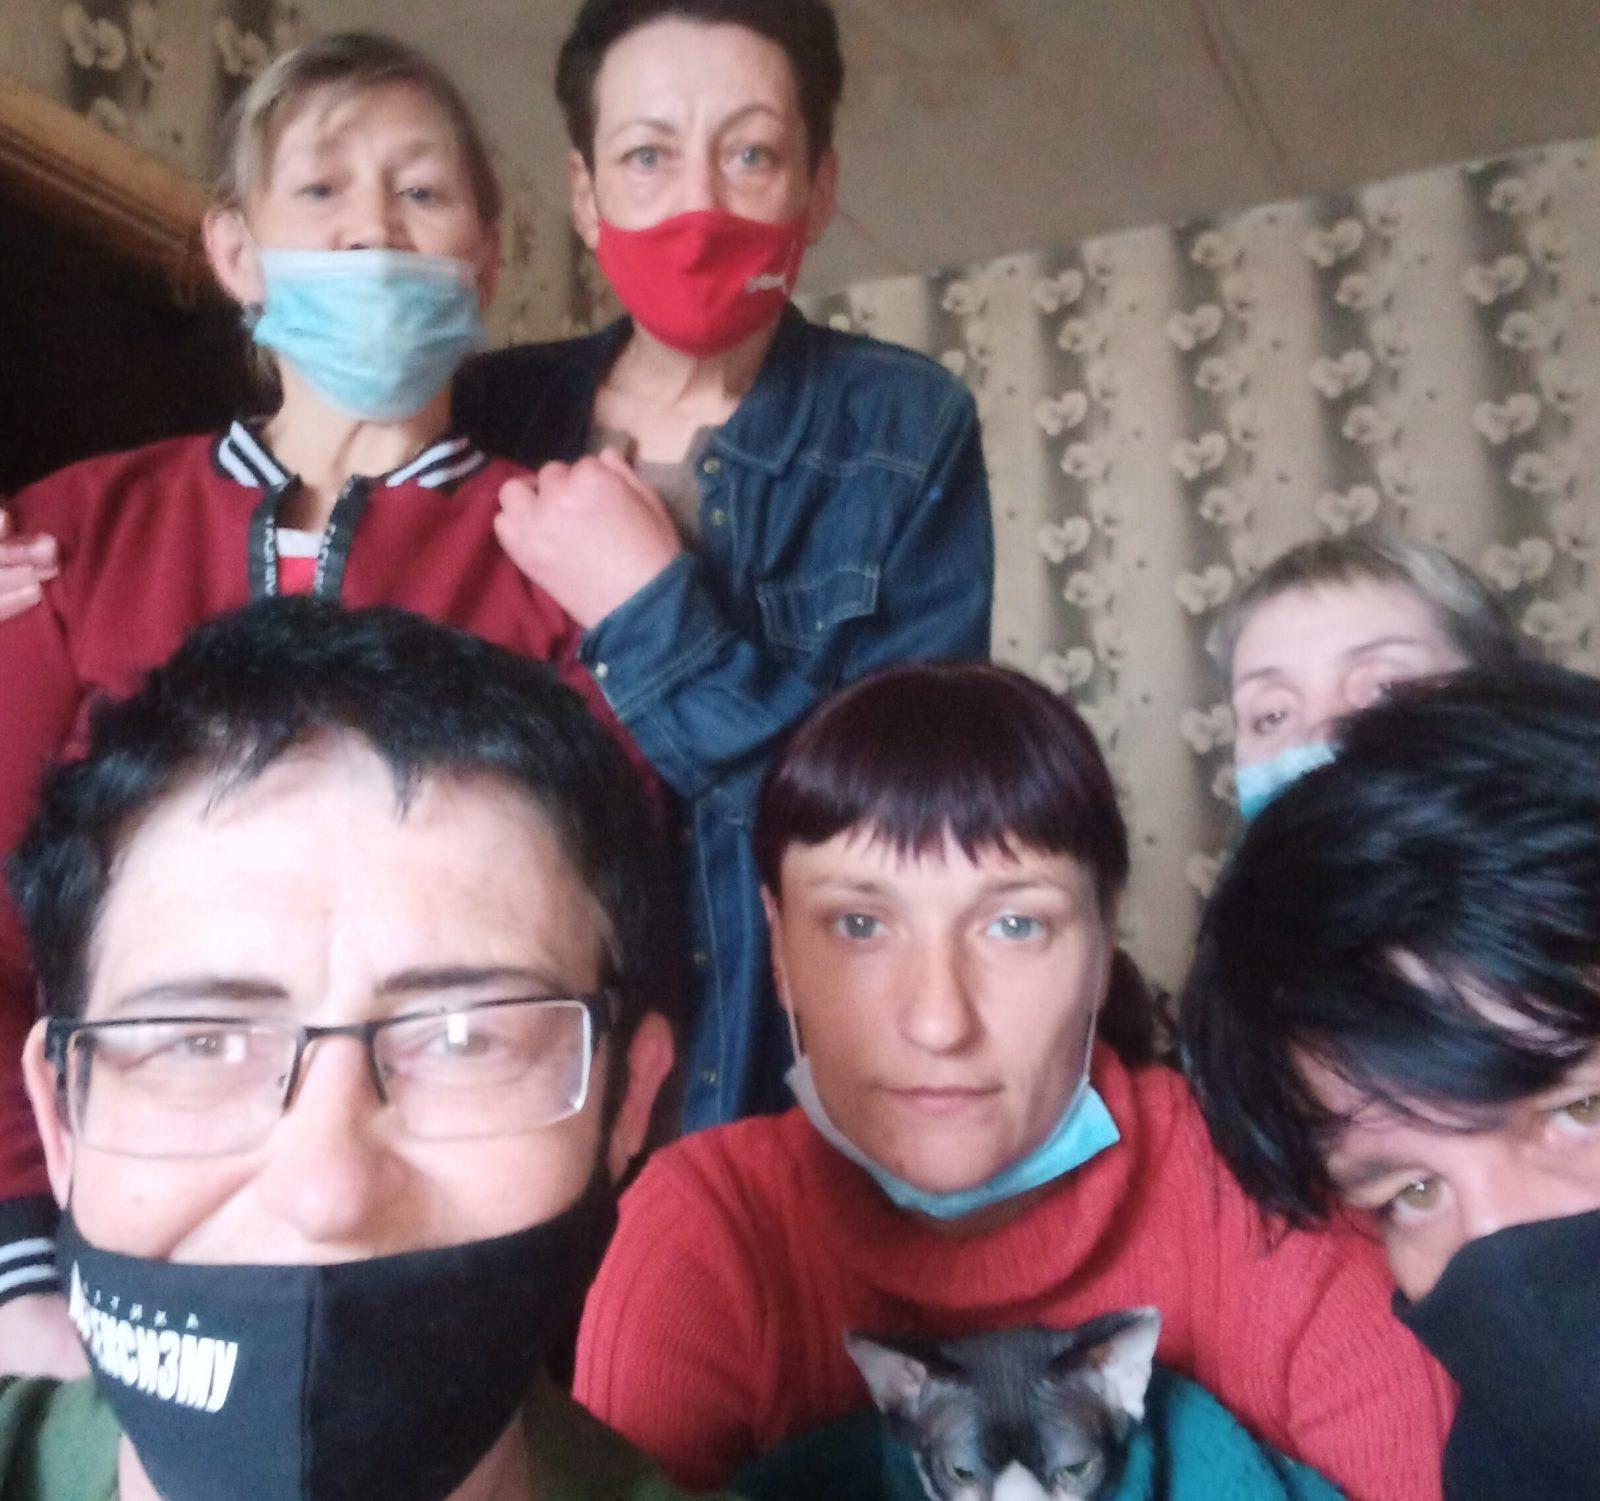 Про гендерно обумовлене насильство говорили у Слов'янську